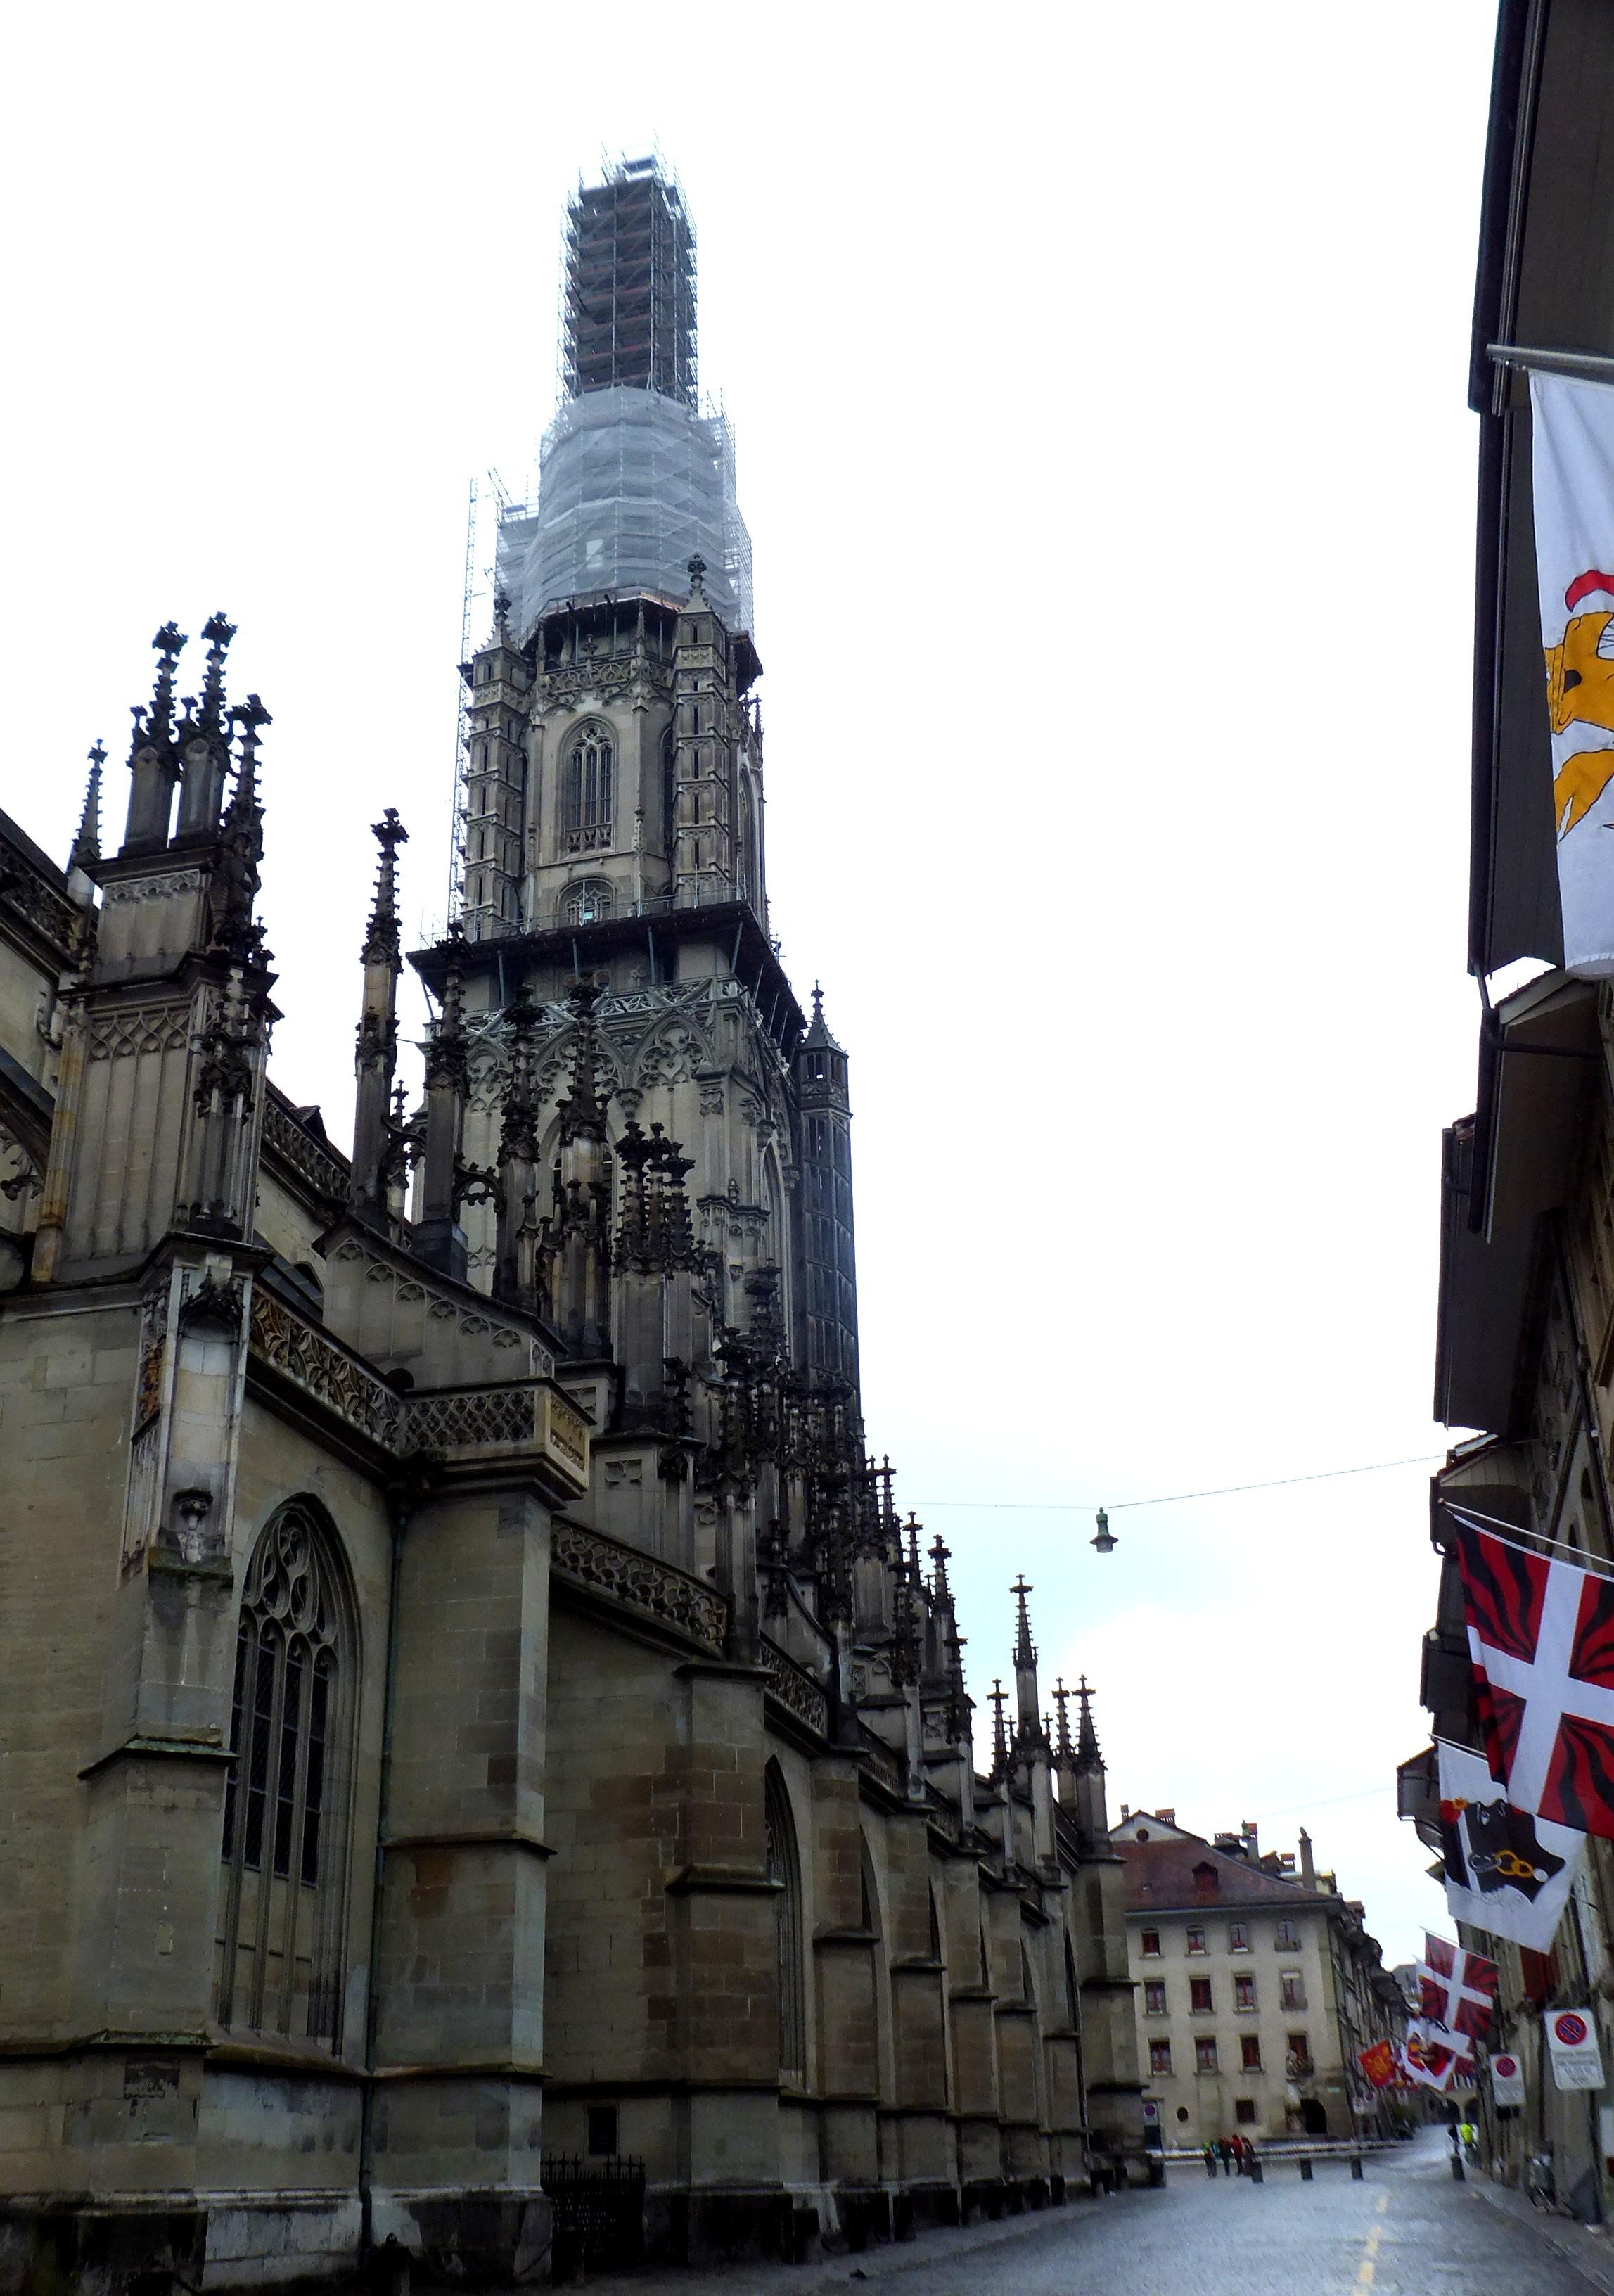 DSCF4047 Bern Cathedral